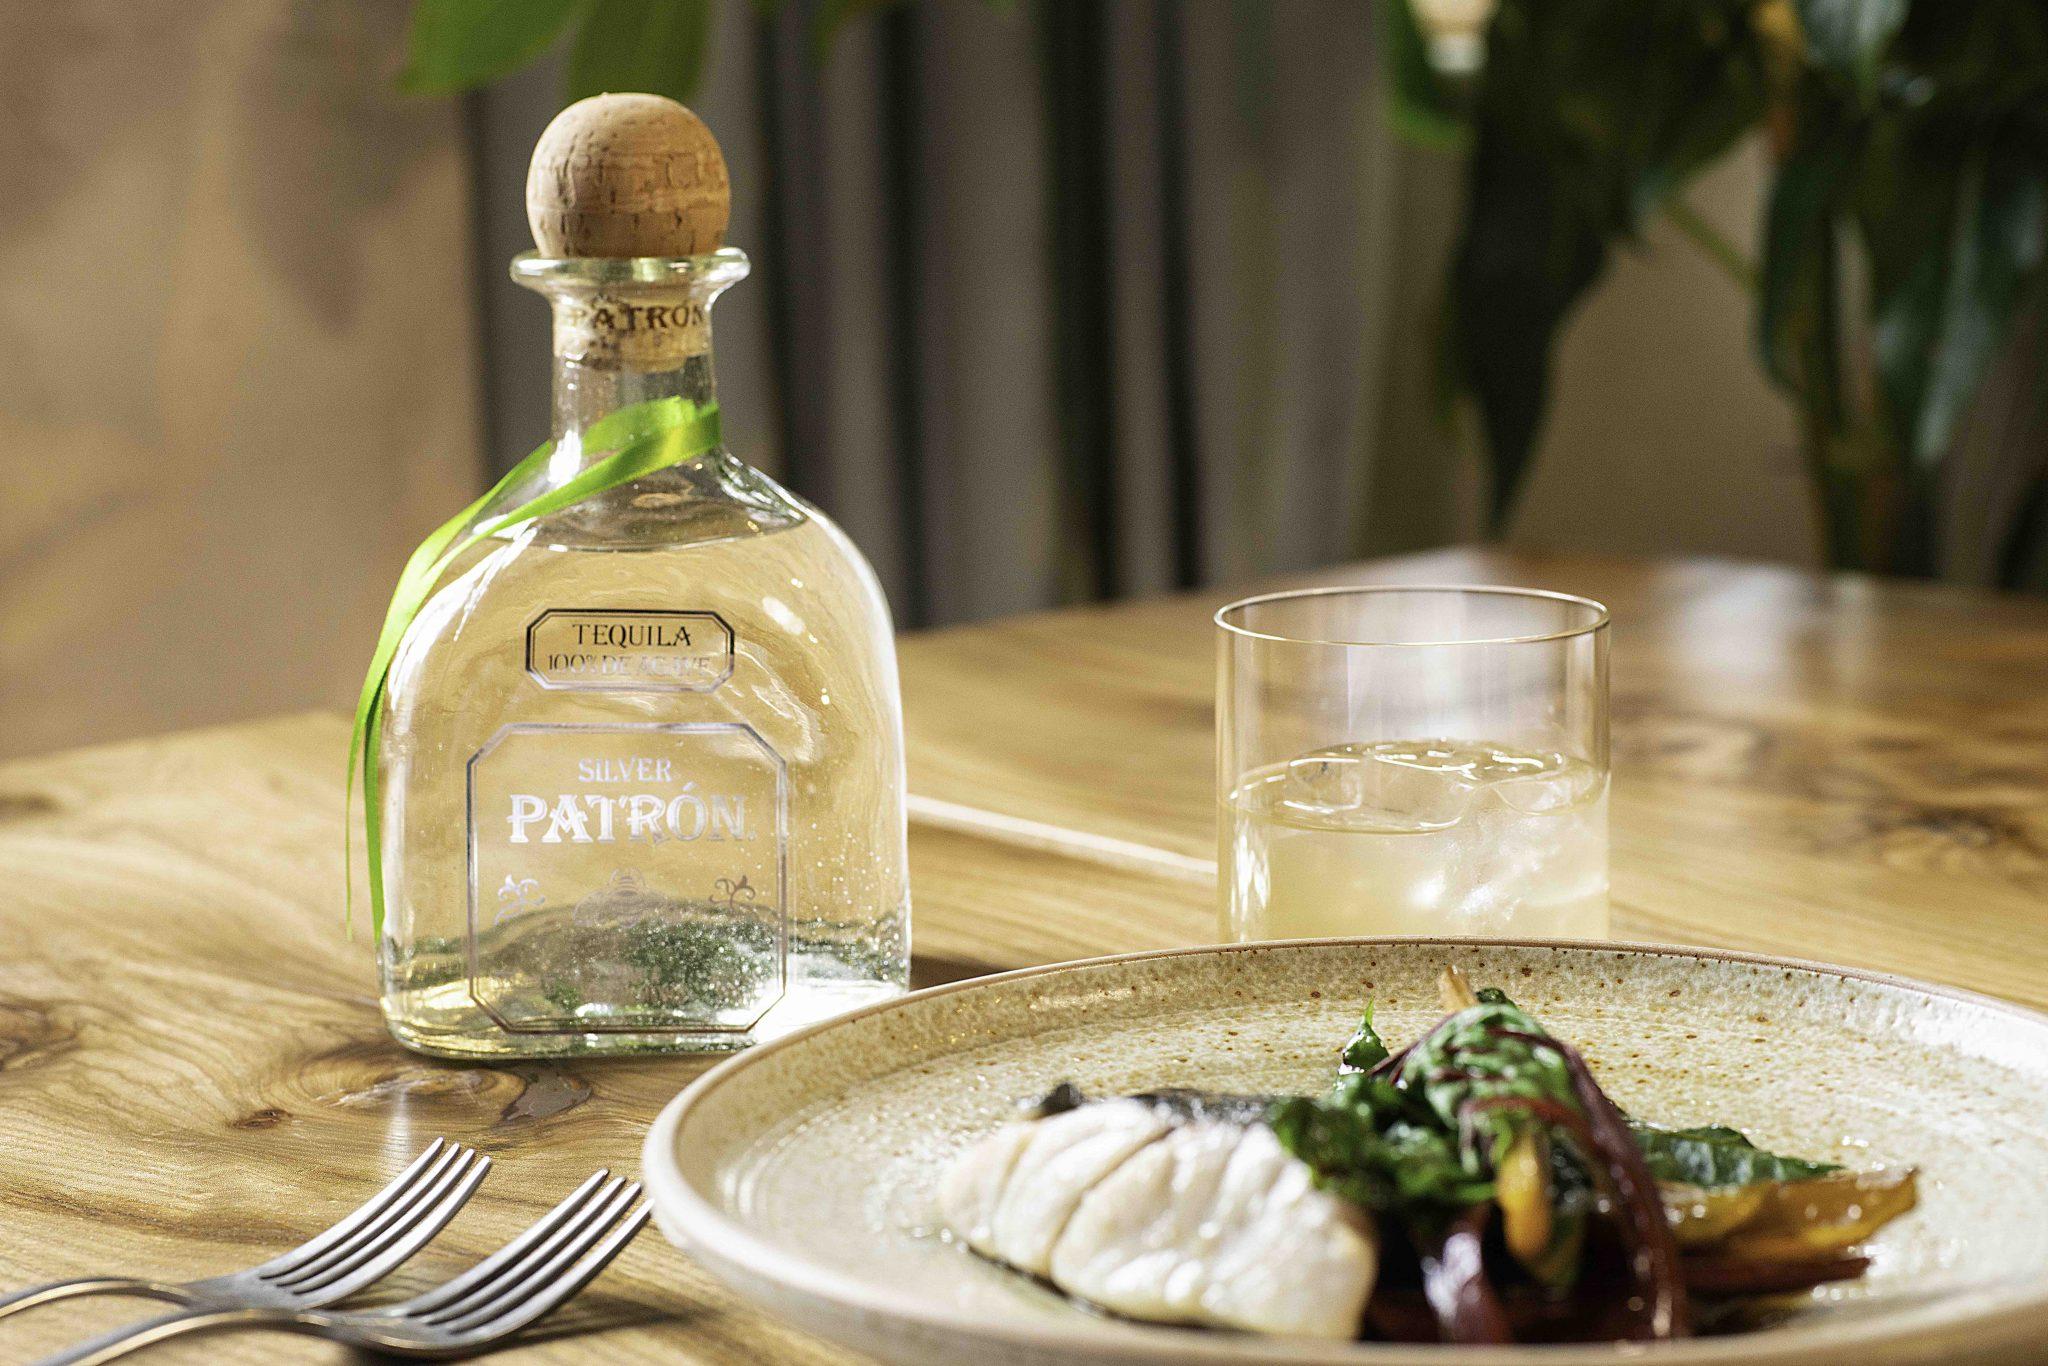 Patrón Apple Earth, Silver bottle and main dish